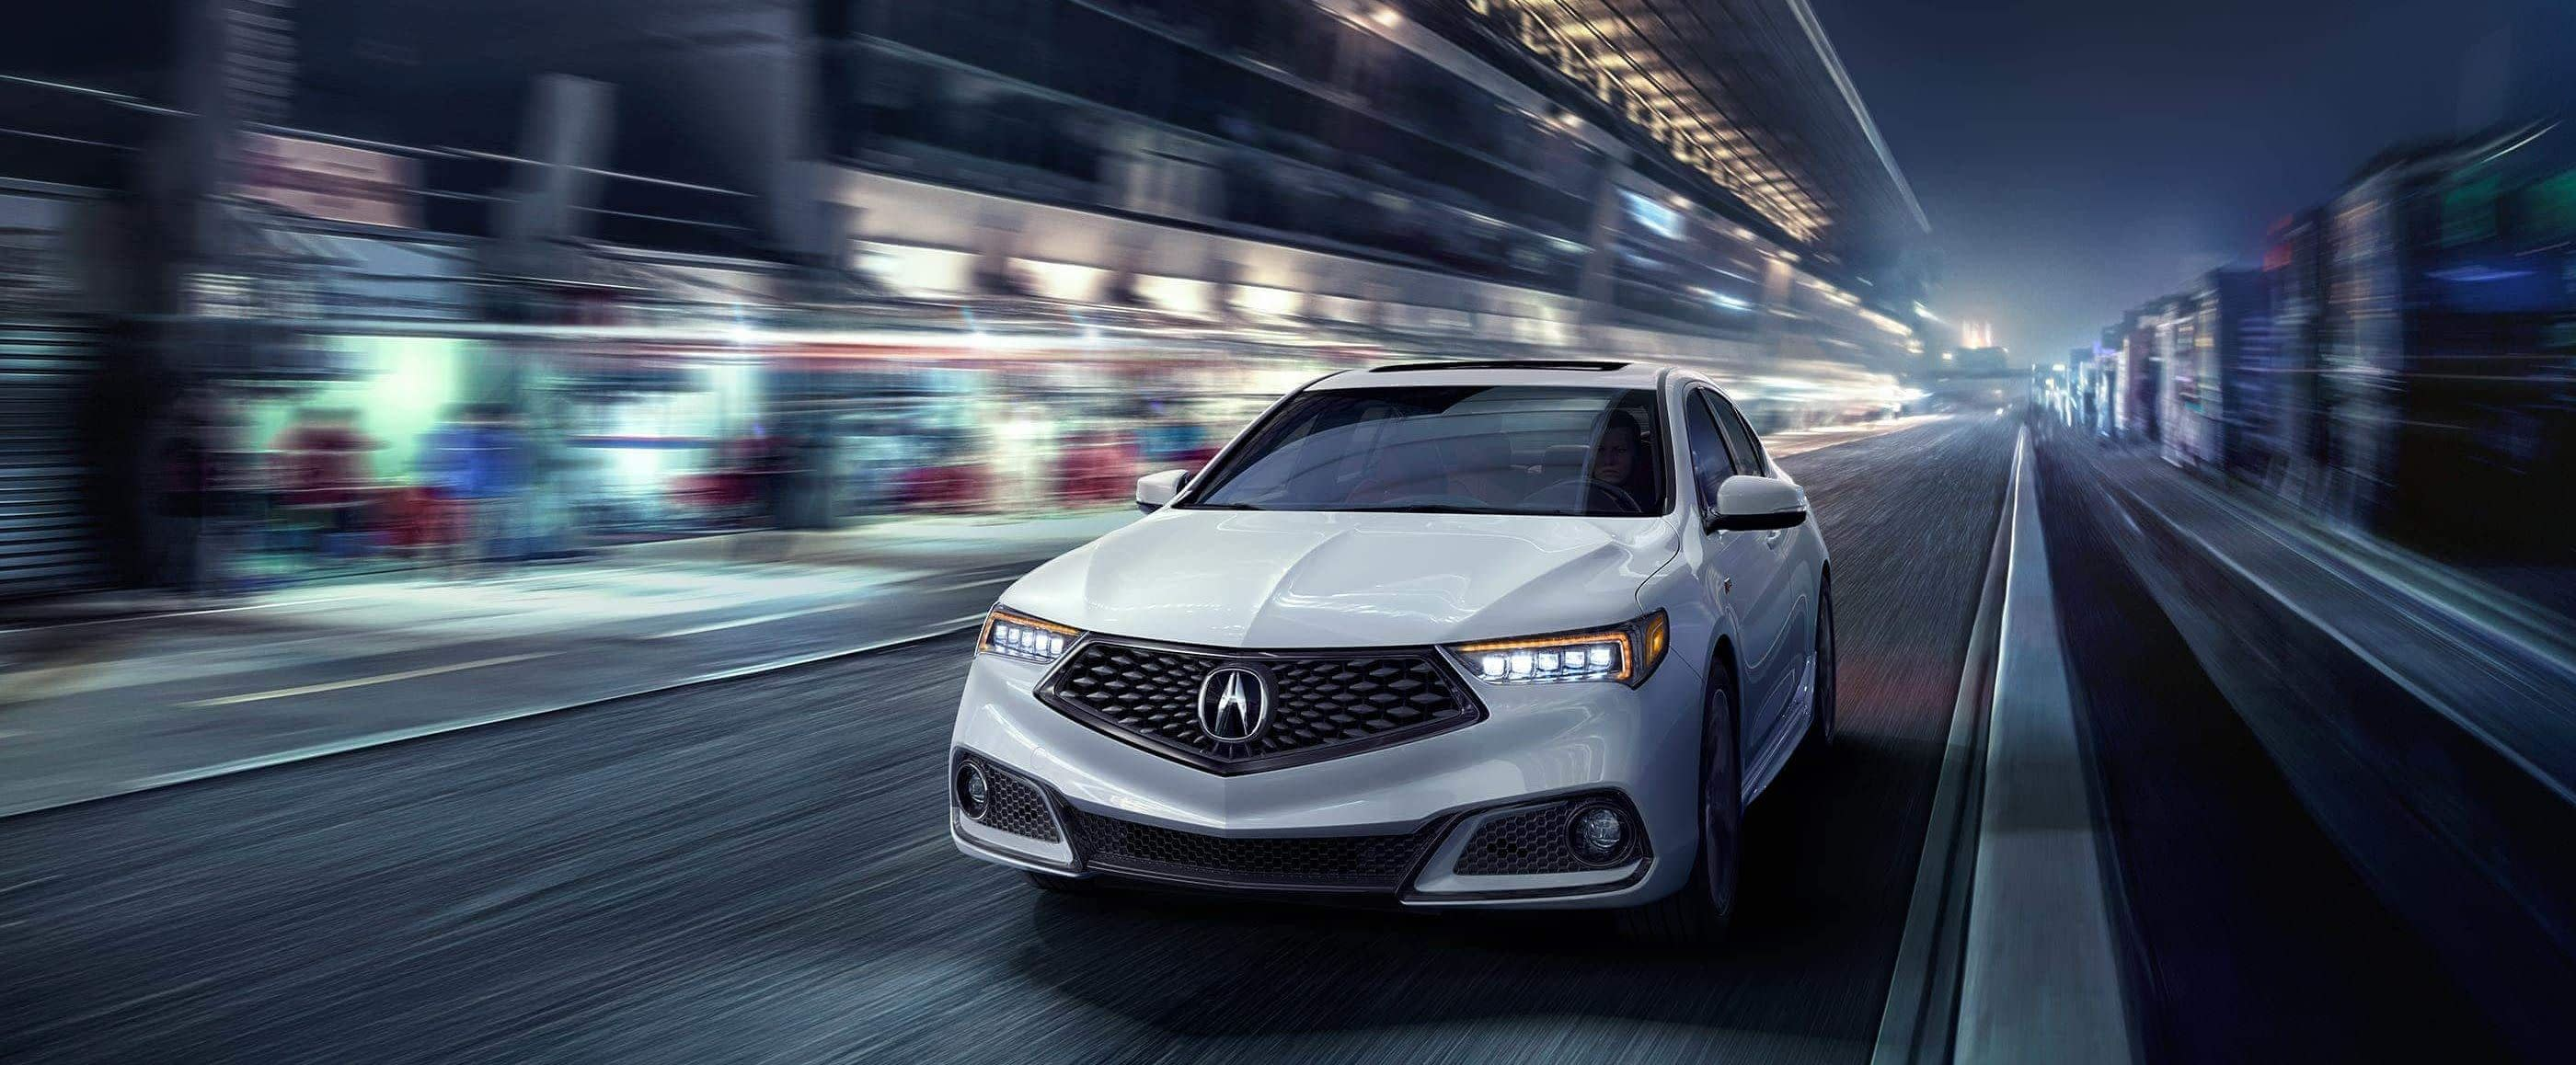 2020 Acura Tlx For Sale Near Chicago Il